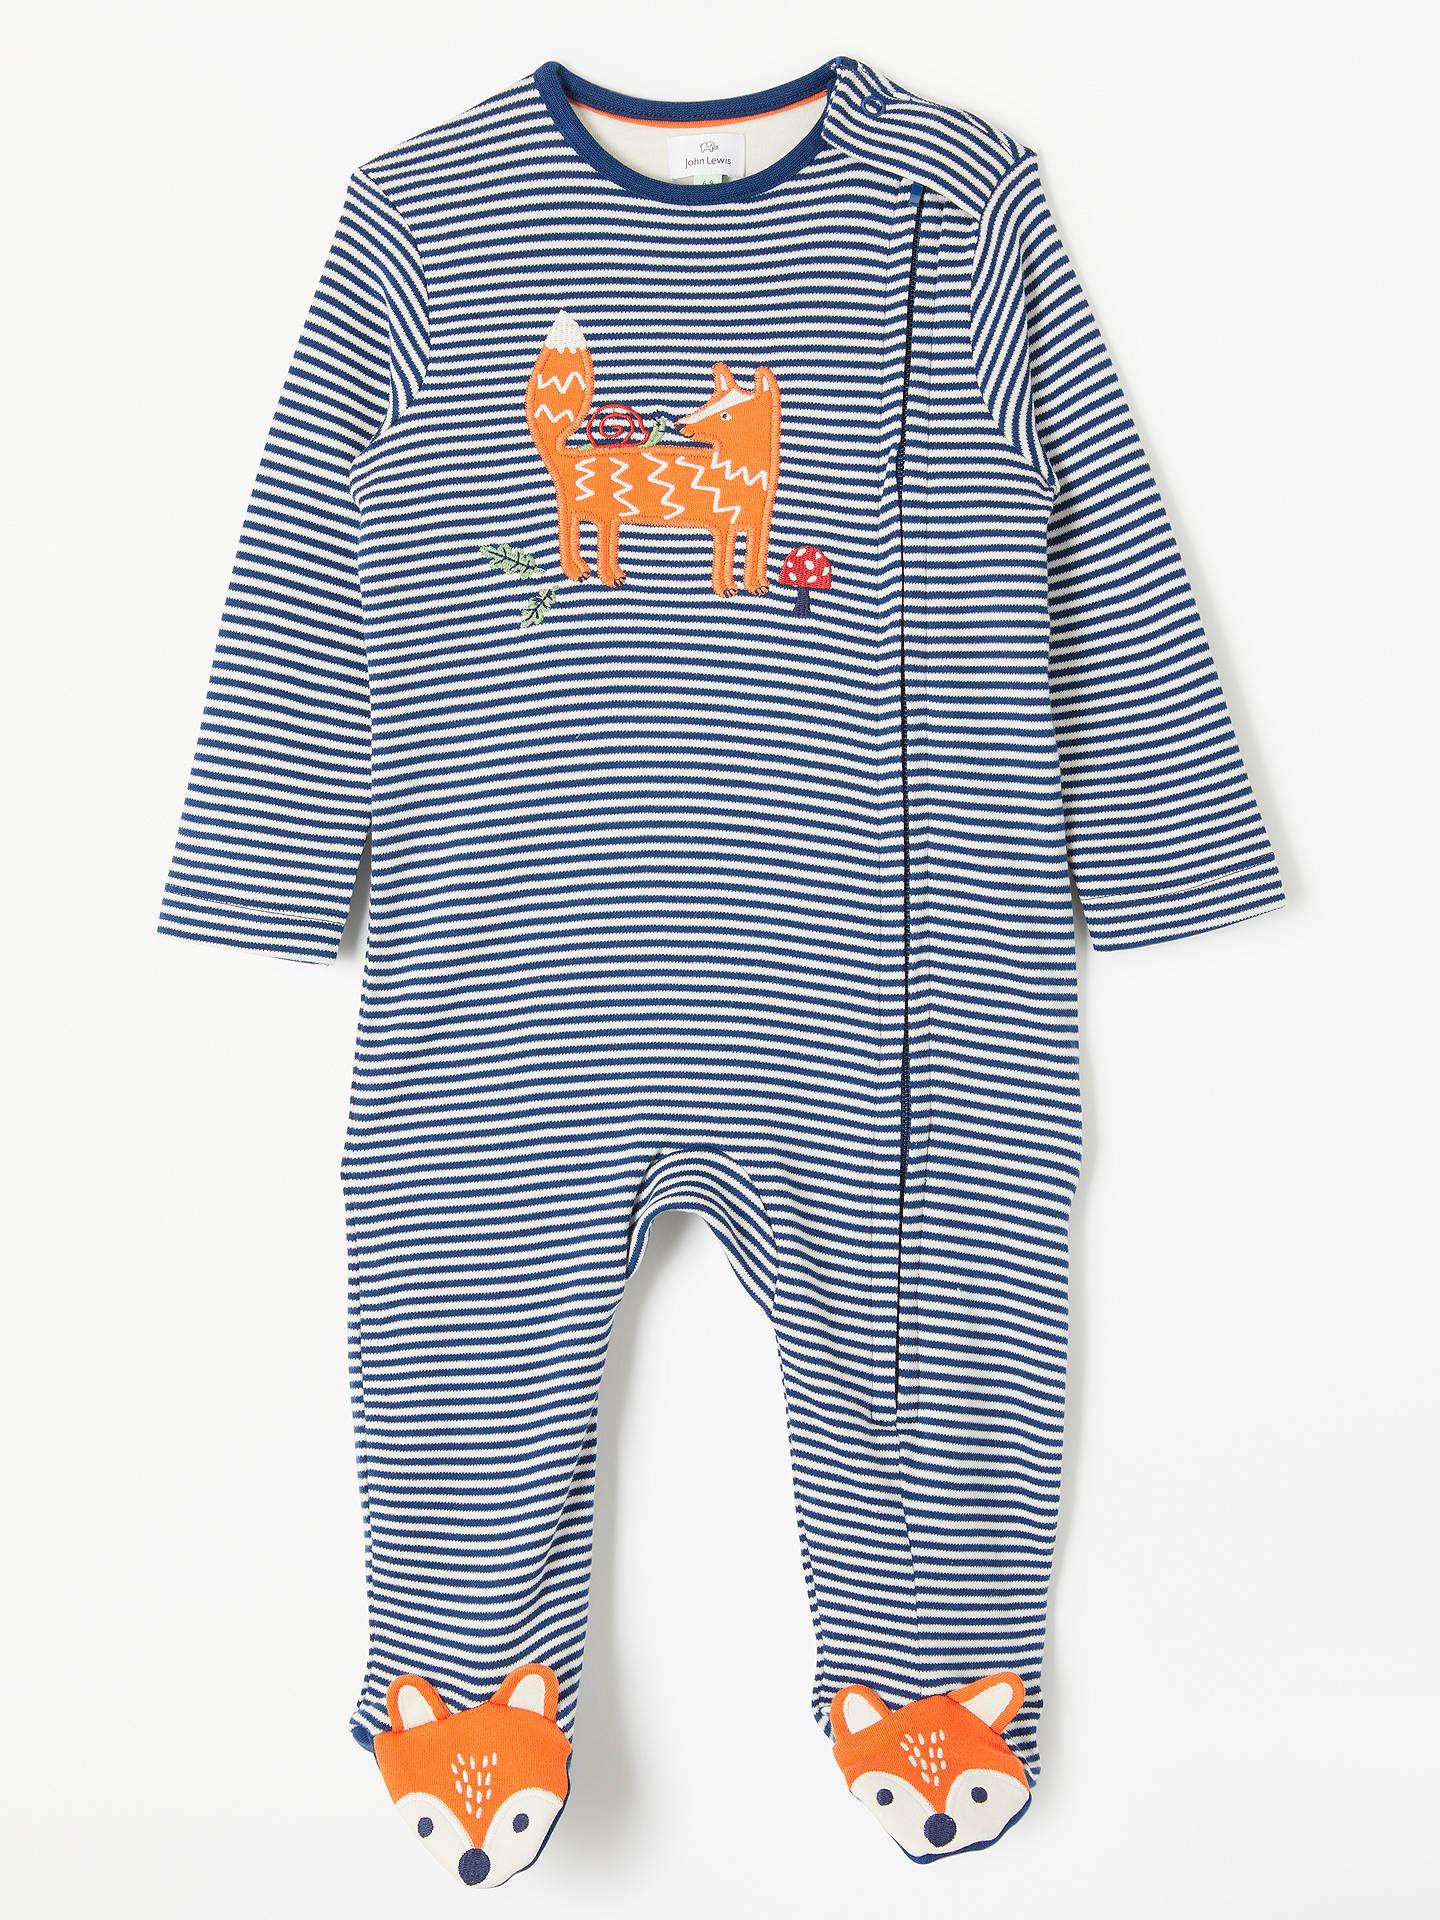 5f70938e06d45 Buy John Lewis   Partners Baby Jersey GOTS Organic Cotton Fox Zip Sleepsuit